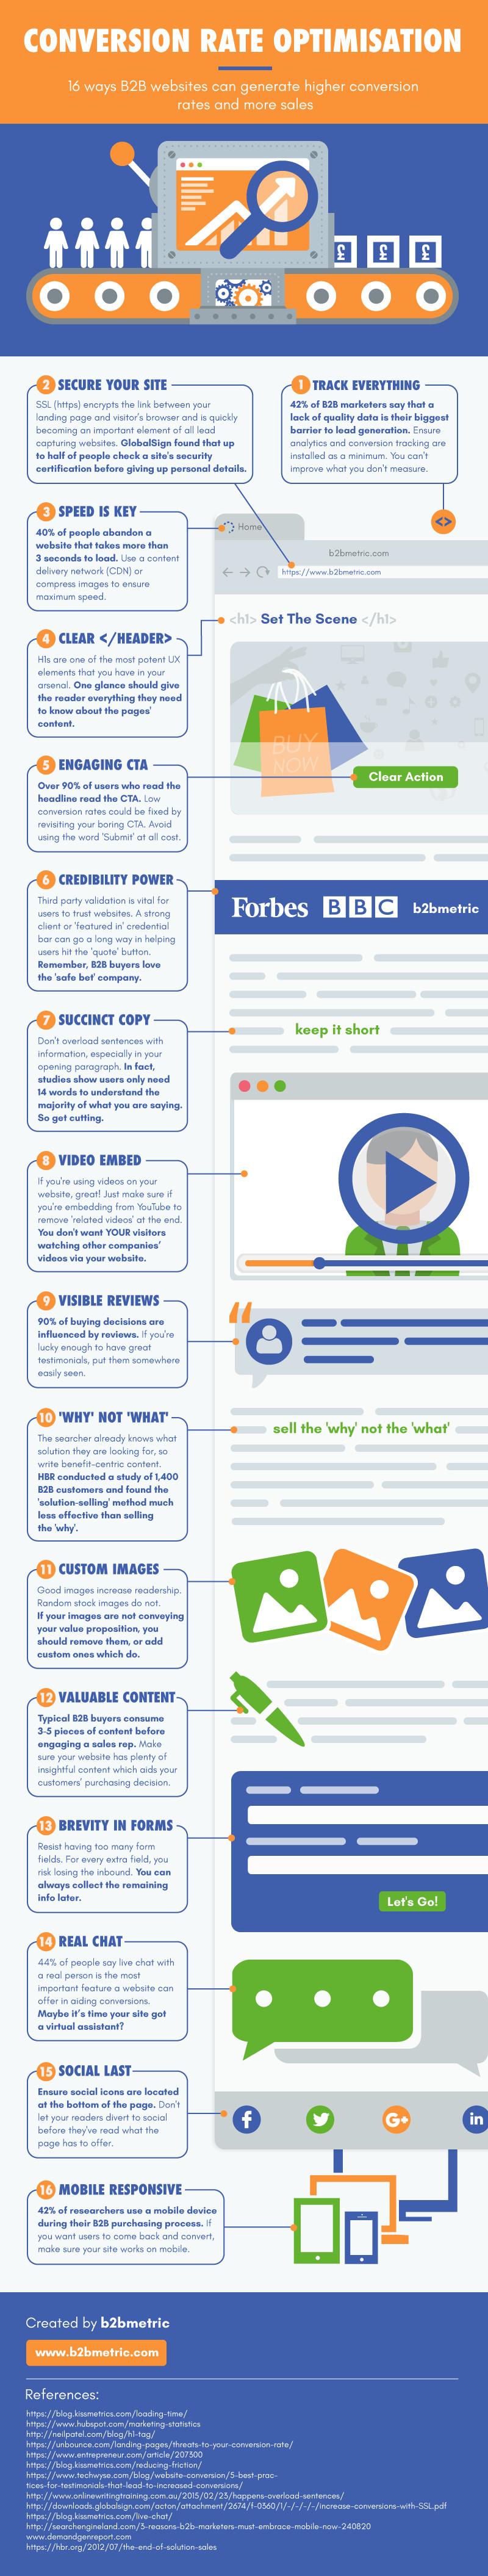 16 Ways B2B Websites Can Optimize Conversion Rates [Infographic]